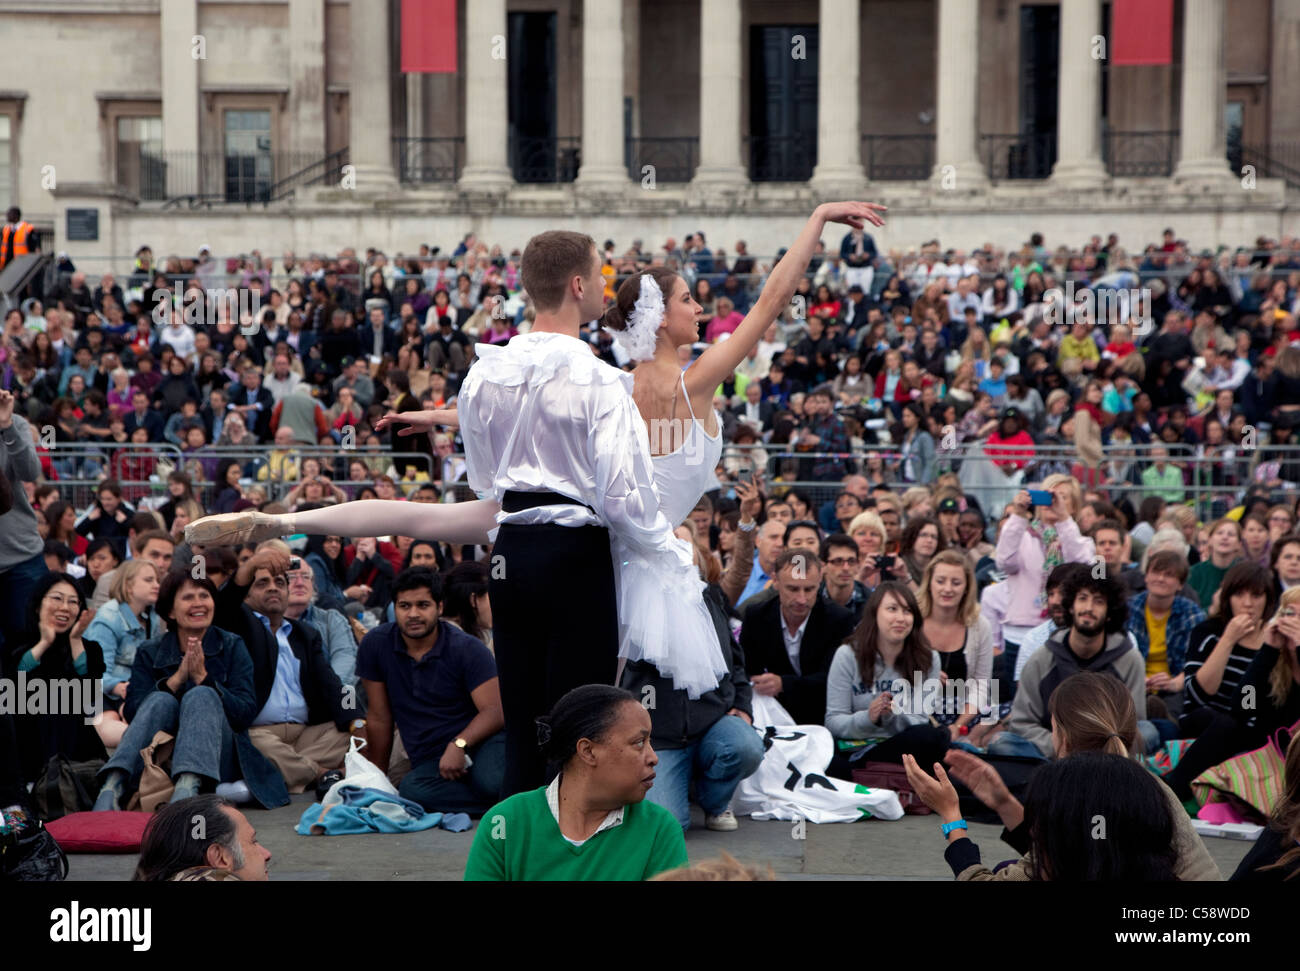 'Guerrilla ballet' protest against BP sponsorship of opera screening in Trafalgar Square, London - Stock Image